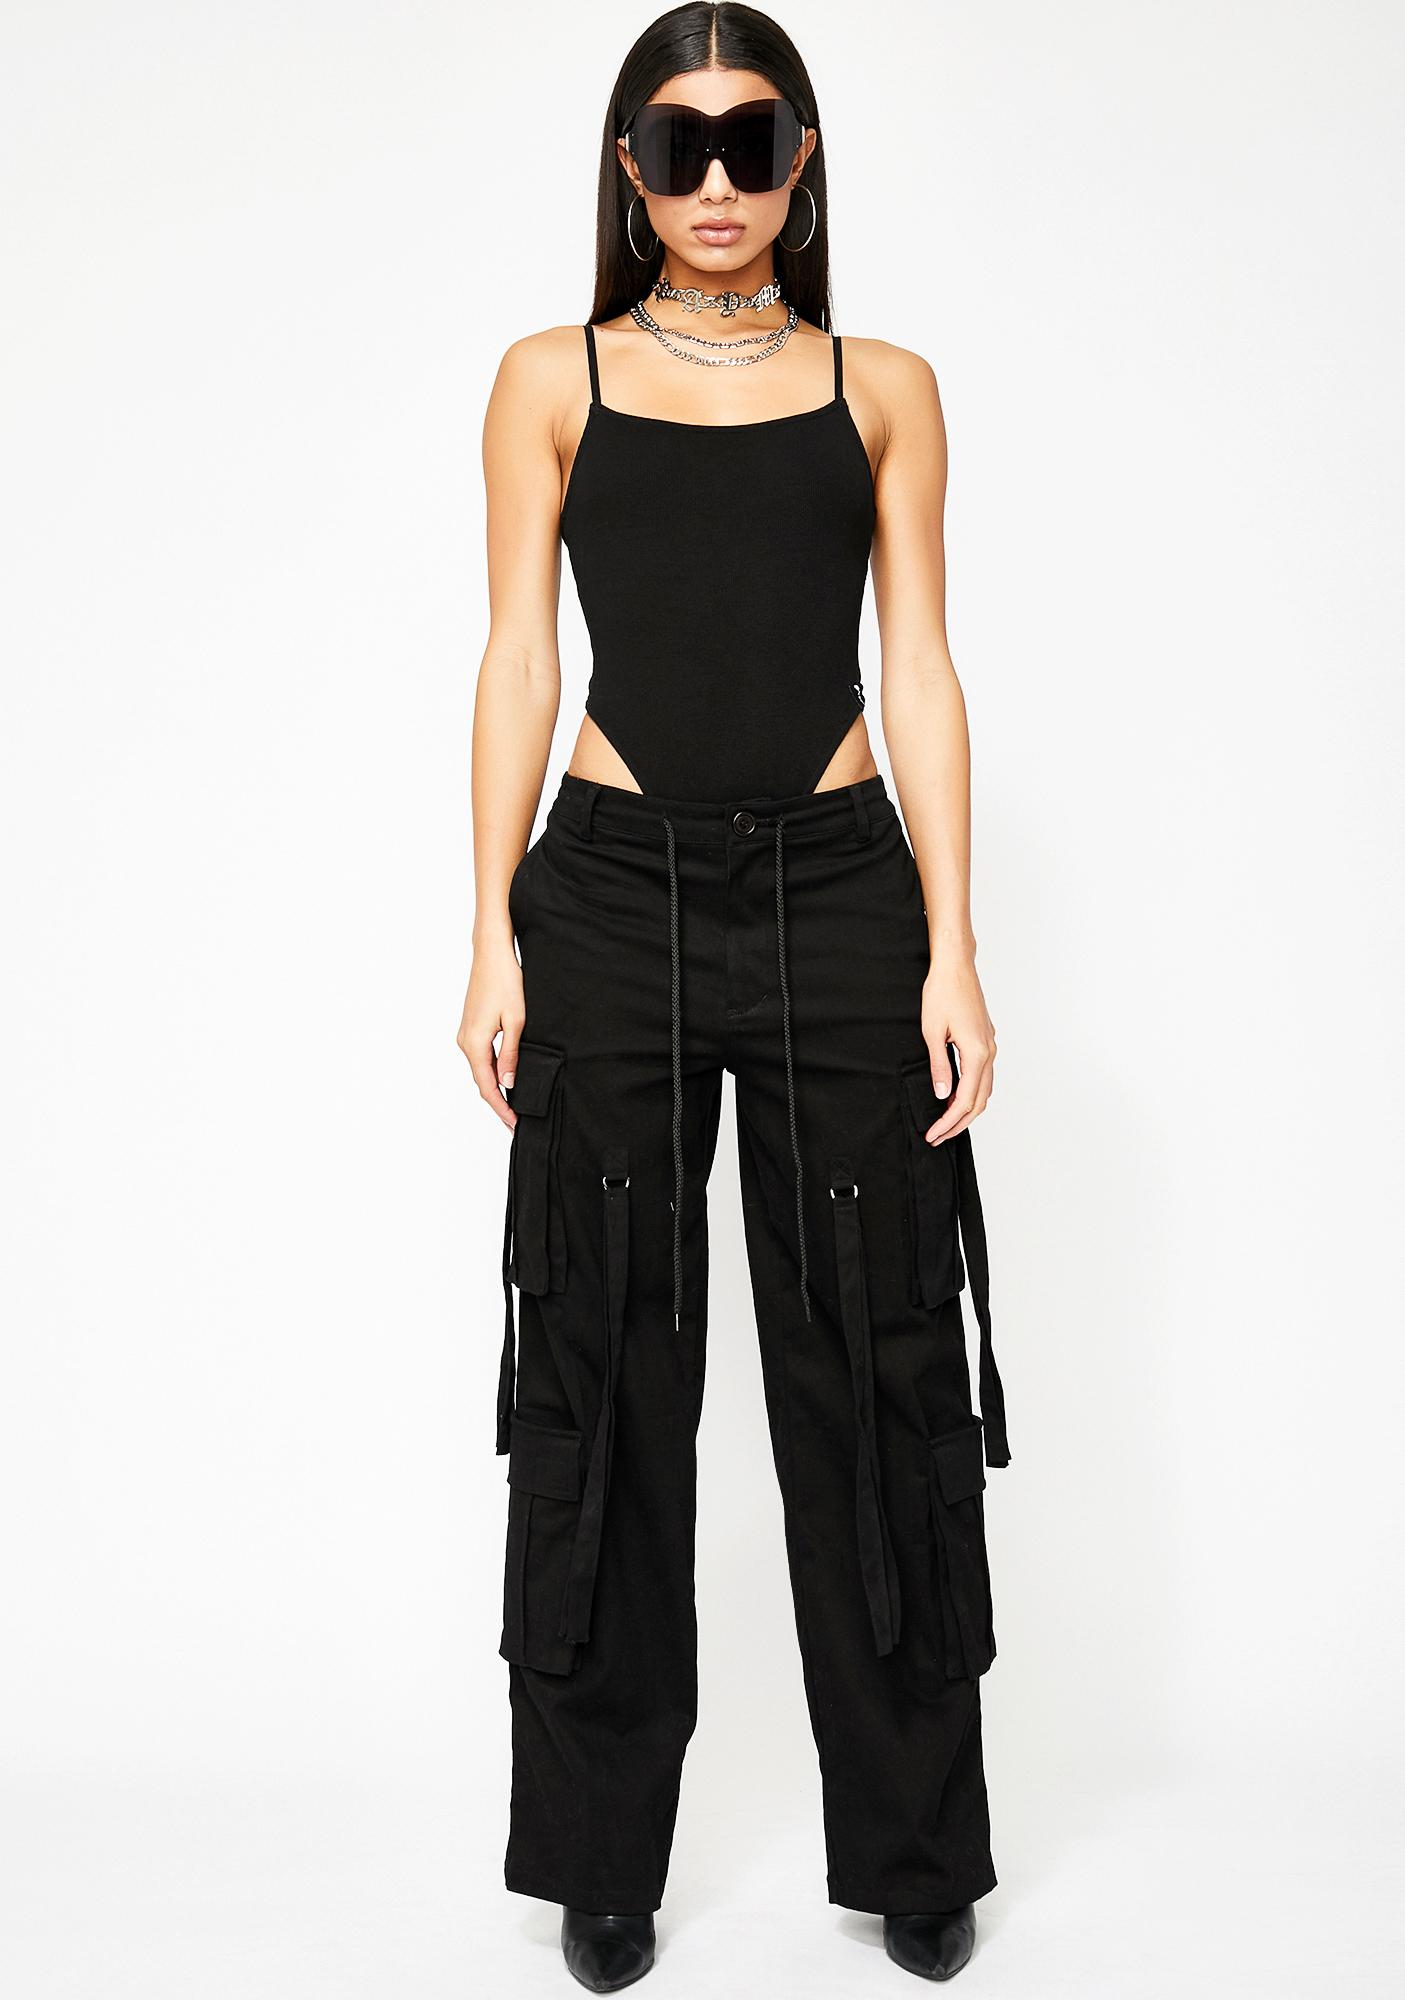 Poster Grl Night Supermodel Ribbed Bodysuit